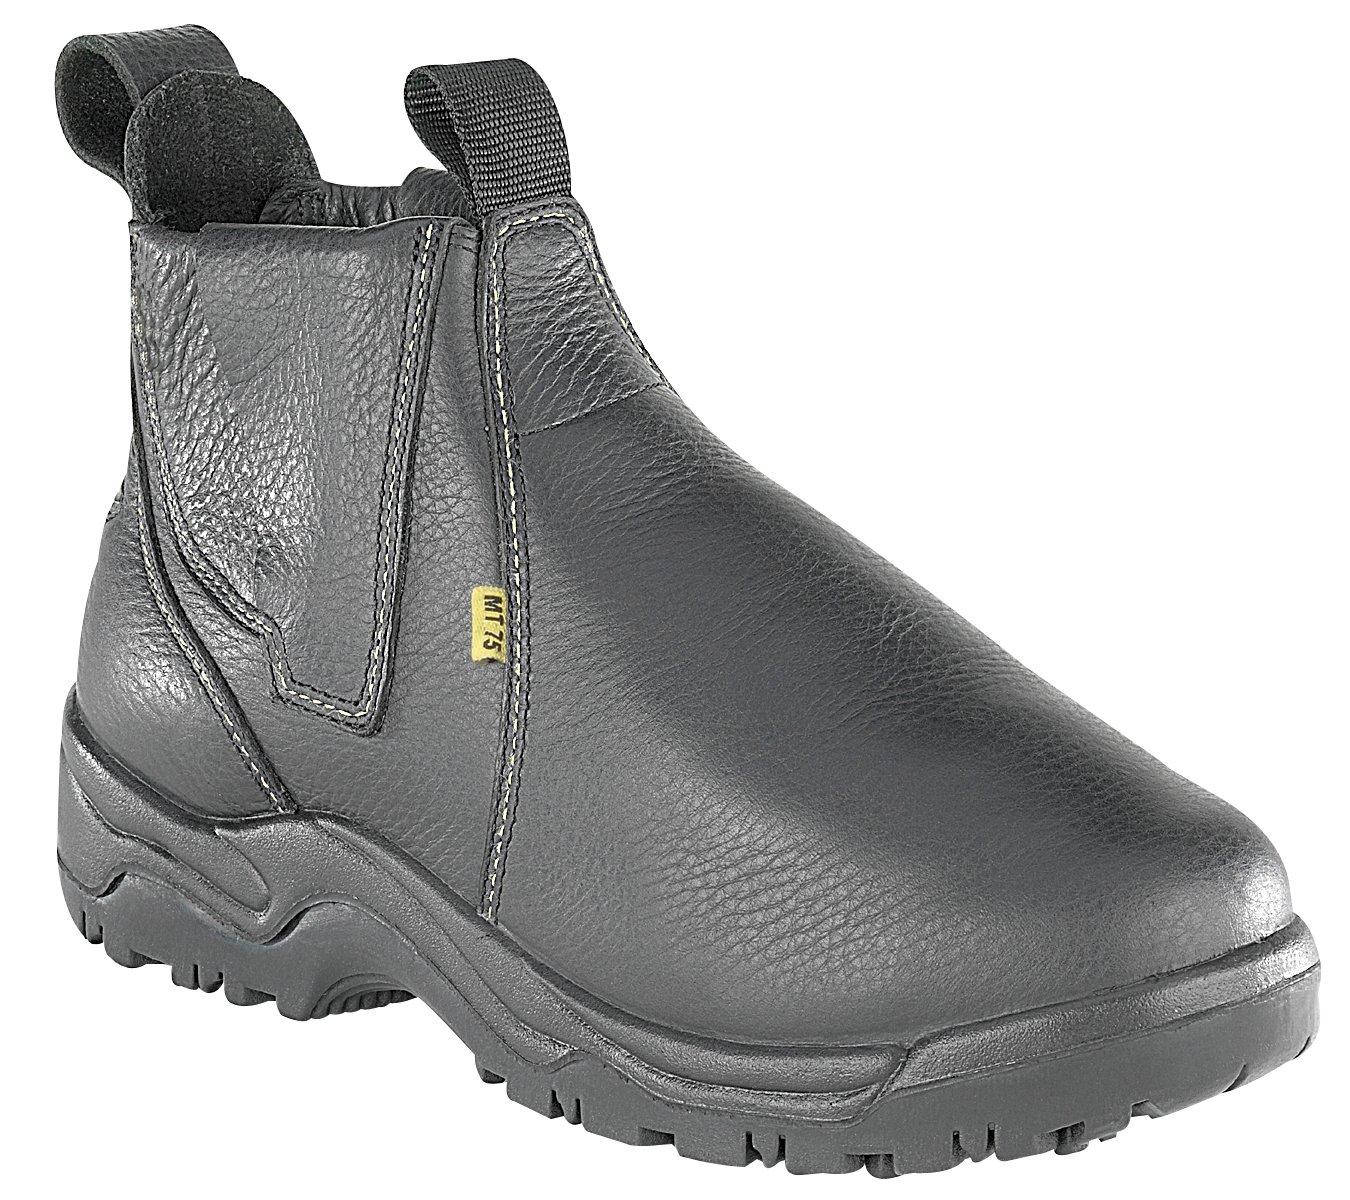 Florsheim Work Men's Hercules FE690 Work Shoe, Black, 13 D US by Florsheim (Image #1)